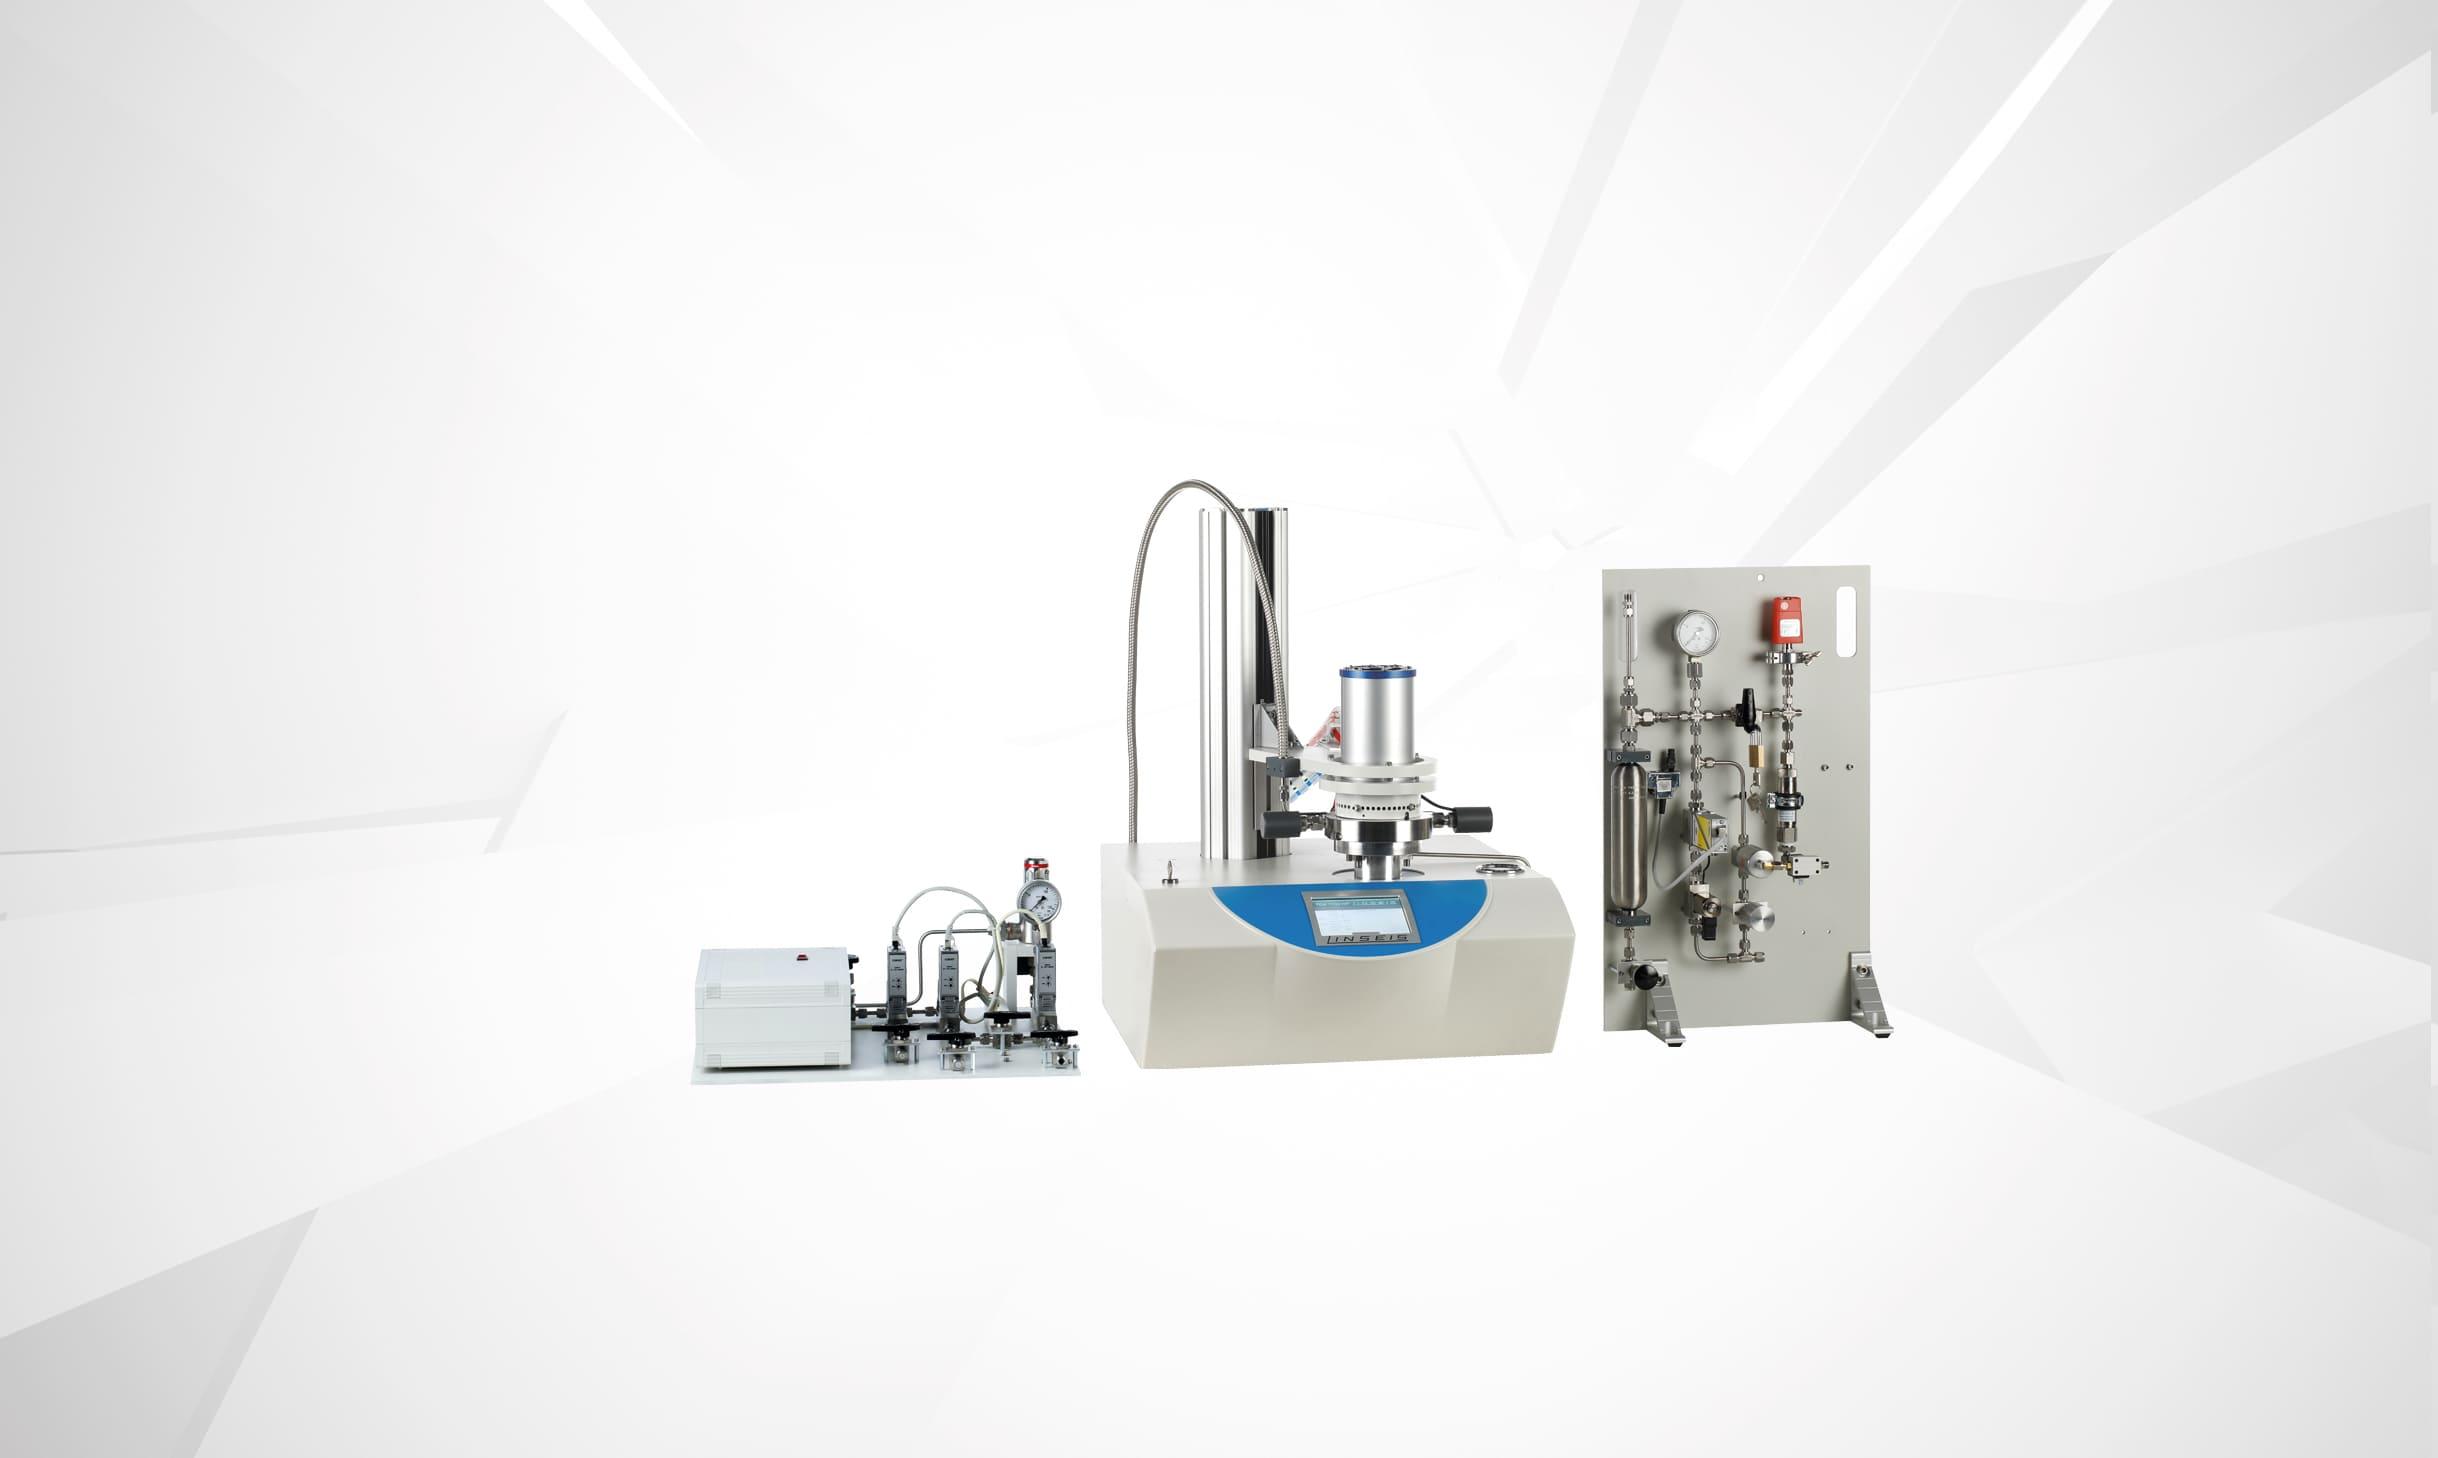 Linseis STA TGA HP 3 Hochdruck - High Pressure Thermal analysis